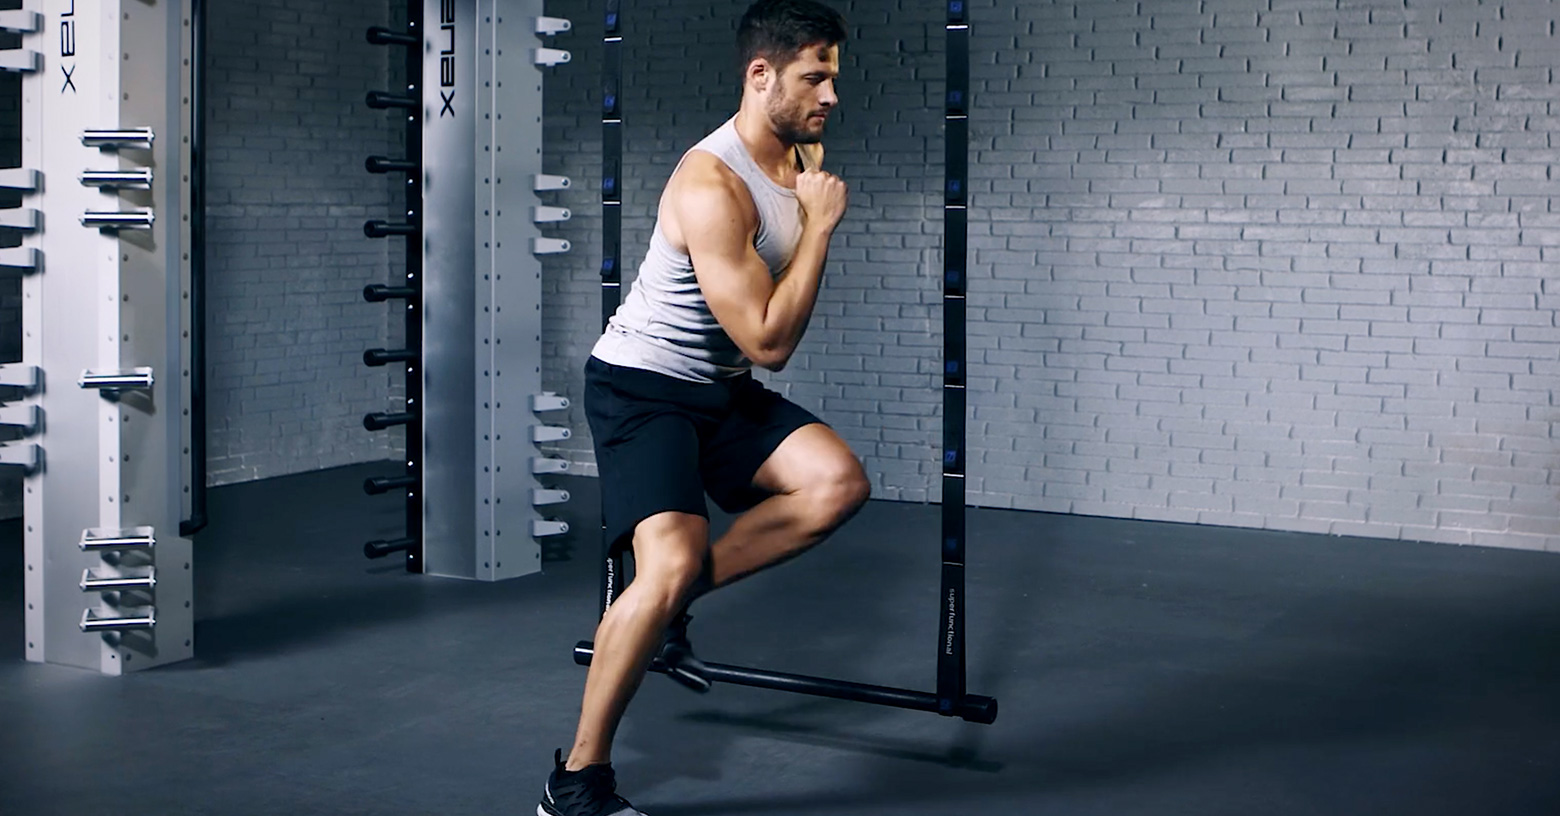 Lateral jumps - Seitliche Sprünge - Sauts latéraux - EVO Fitness